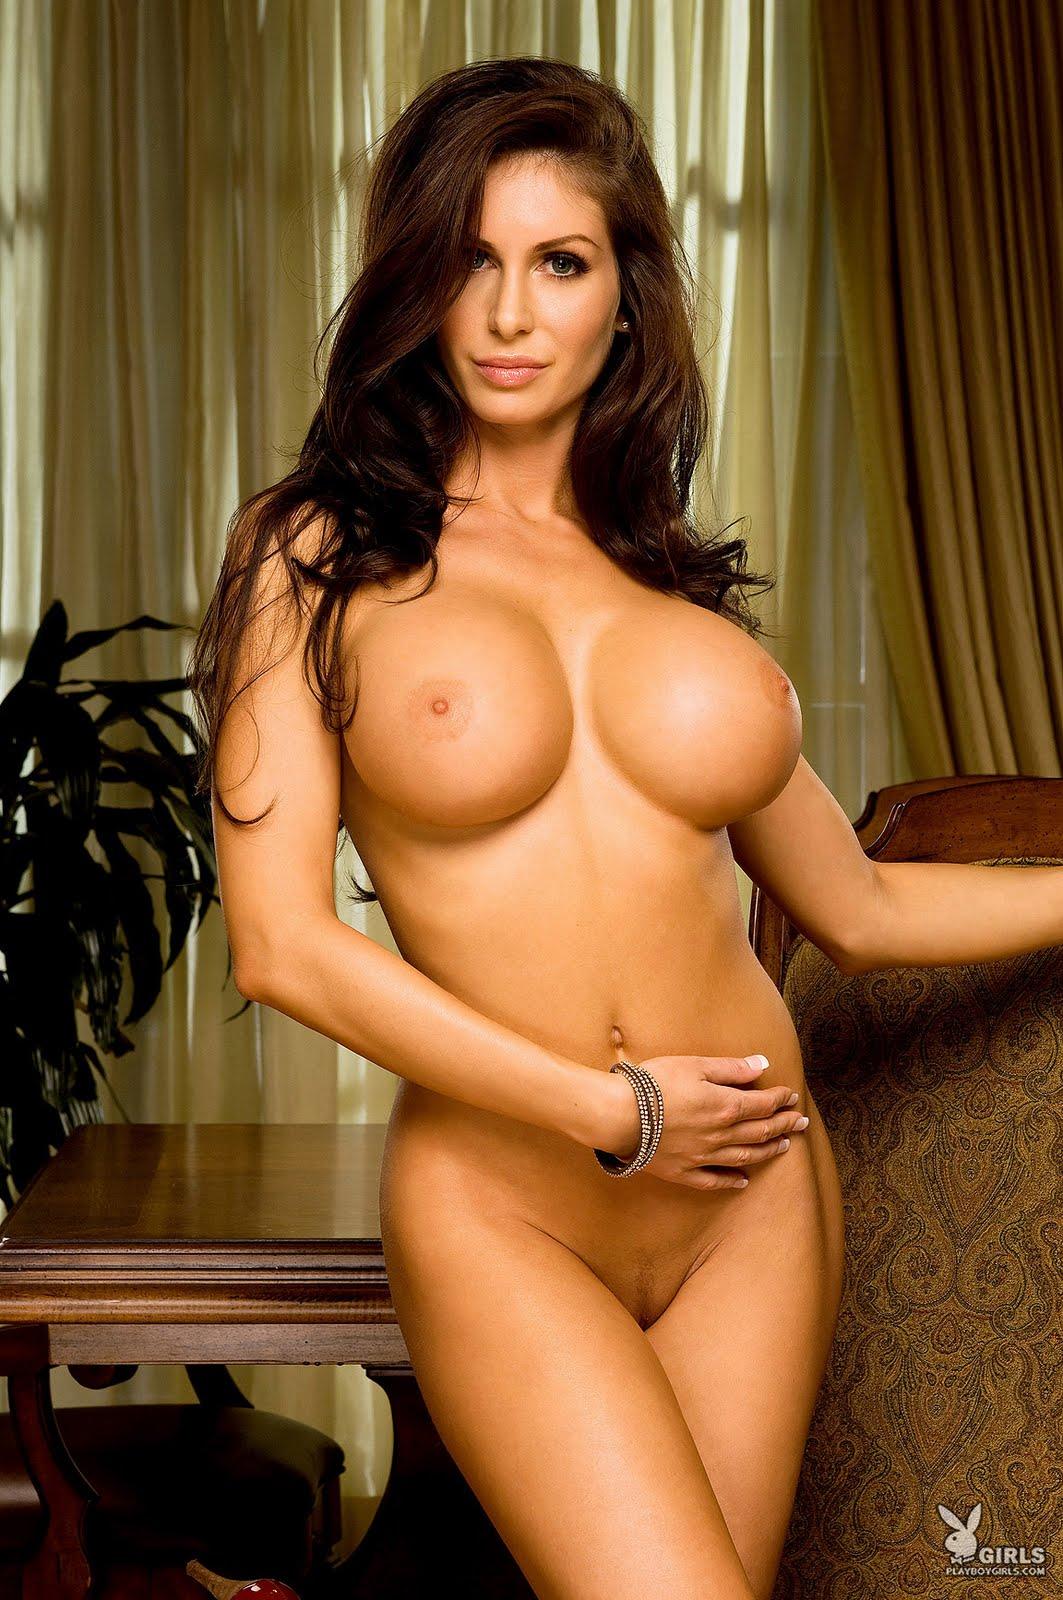 Dejlige Italien Megan Voss Busty Babes Photo Set-1-9088